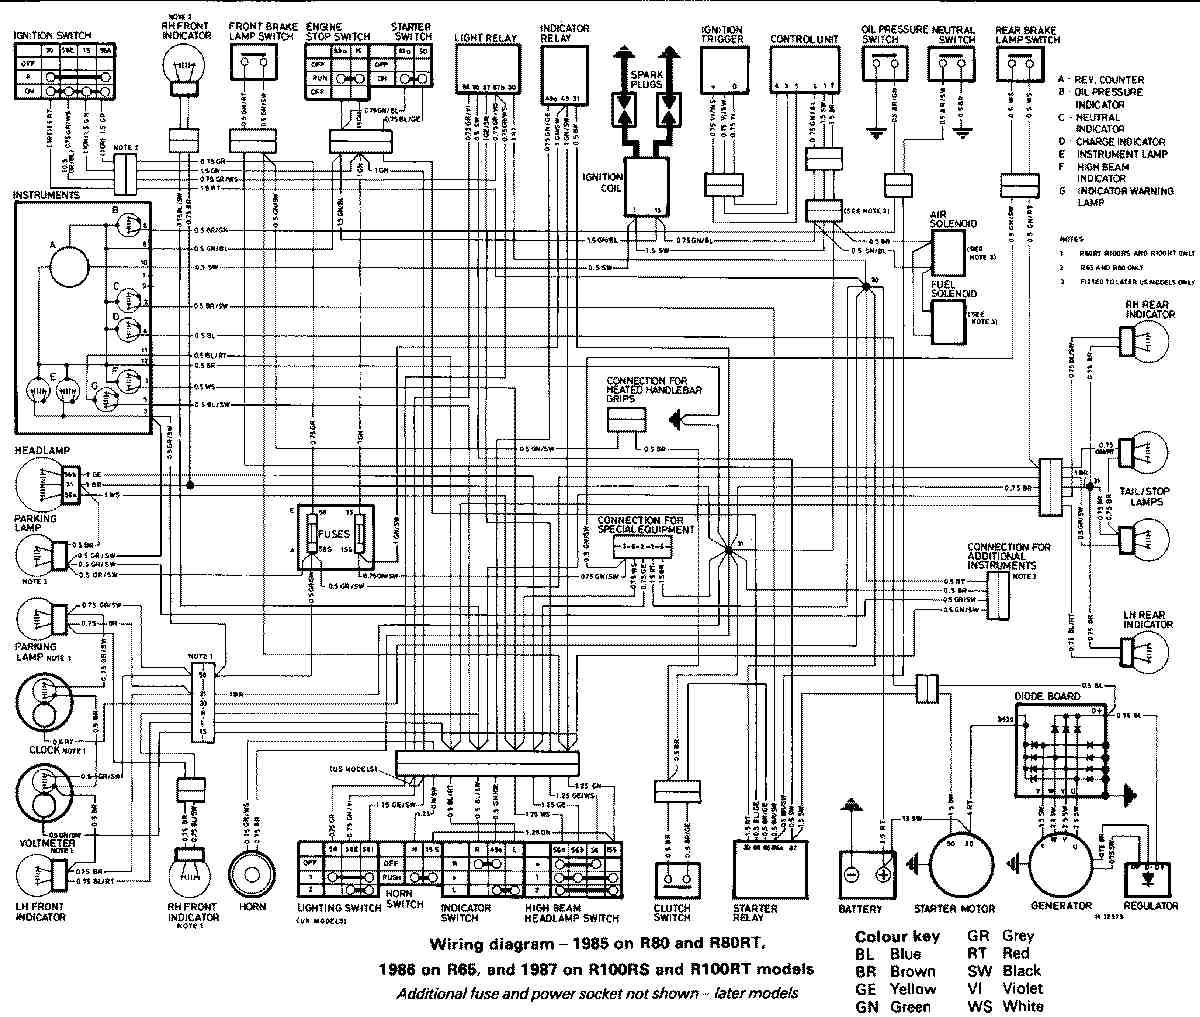 BMW+R80%252C+R80RT%252C+R65%252C+R100RS+and+R100RT+1985 1987+Motorcycle+Wiring+Diagram?resizeu003d665%2C564 97 bmw 328i e36 fuse box diagram free download wiring diagram